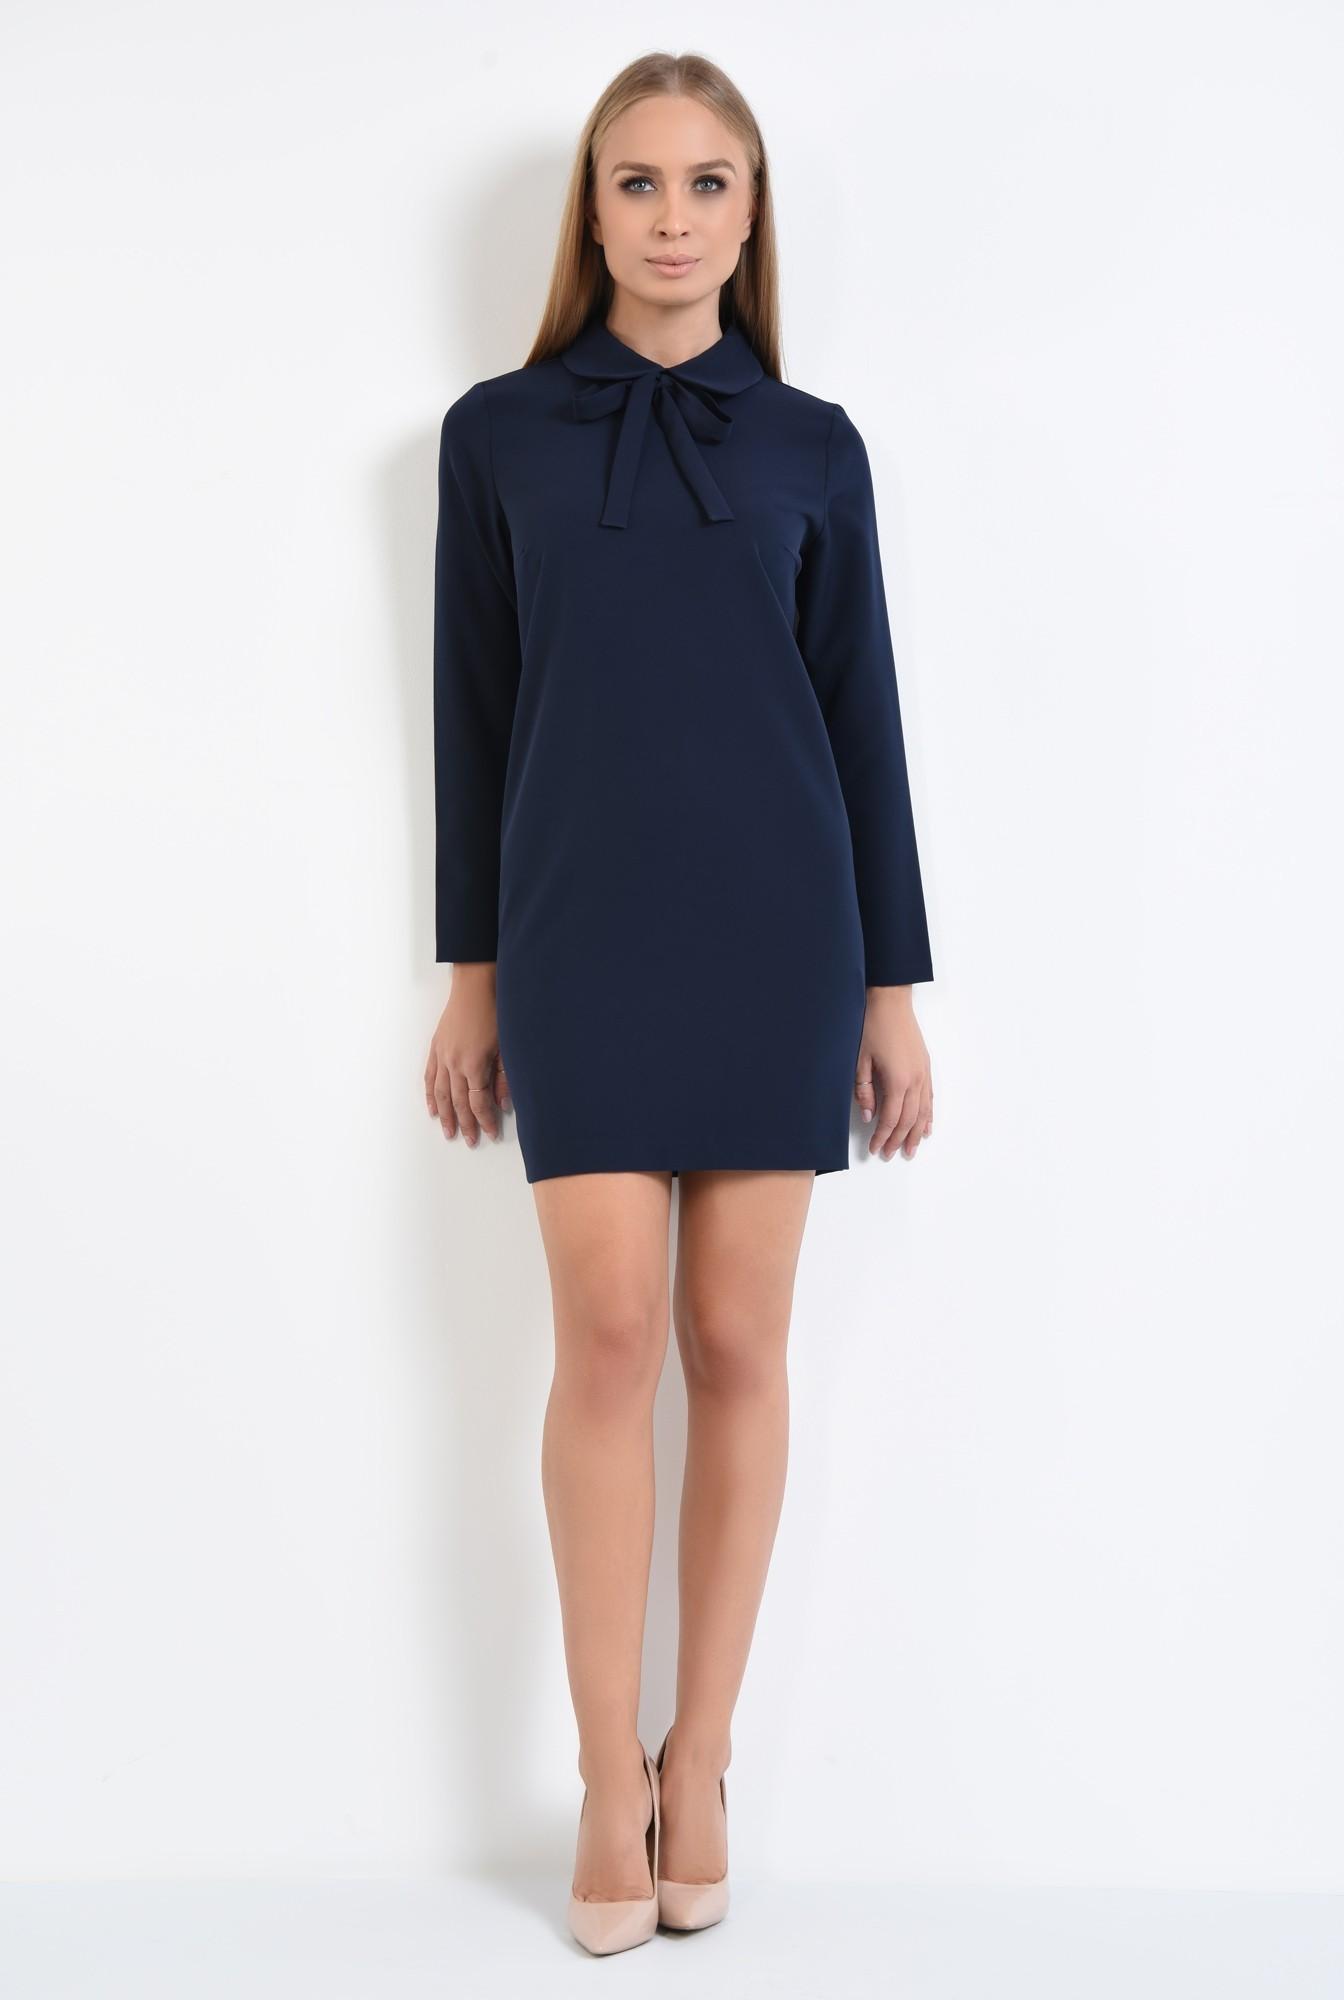 3 - rochie de zi, scurta, bleumarin, maneci lungi